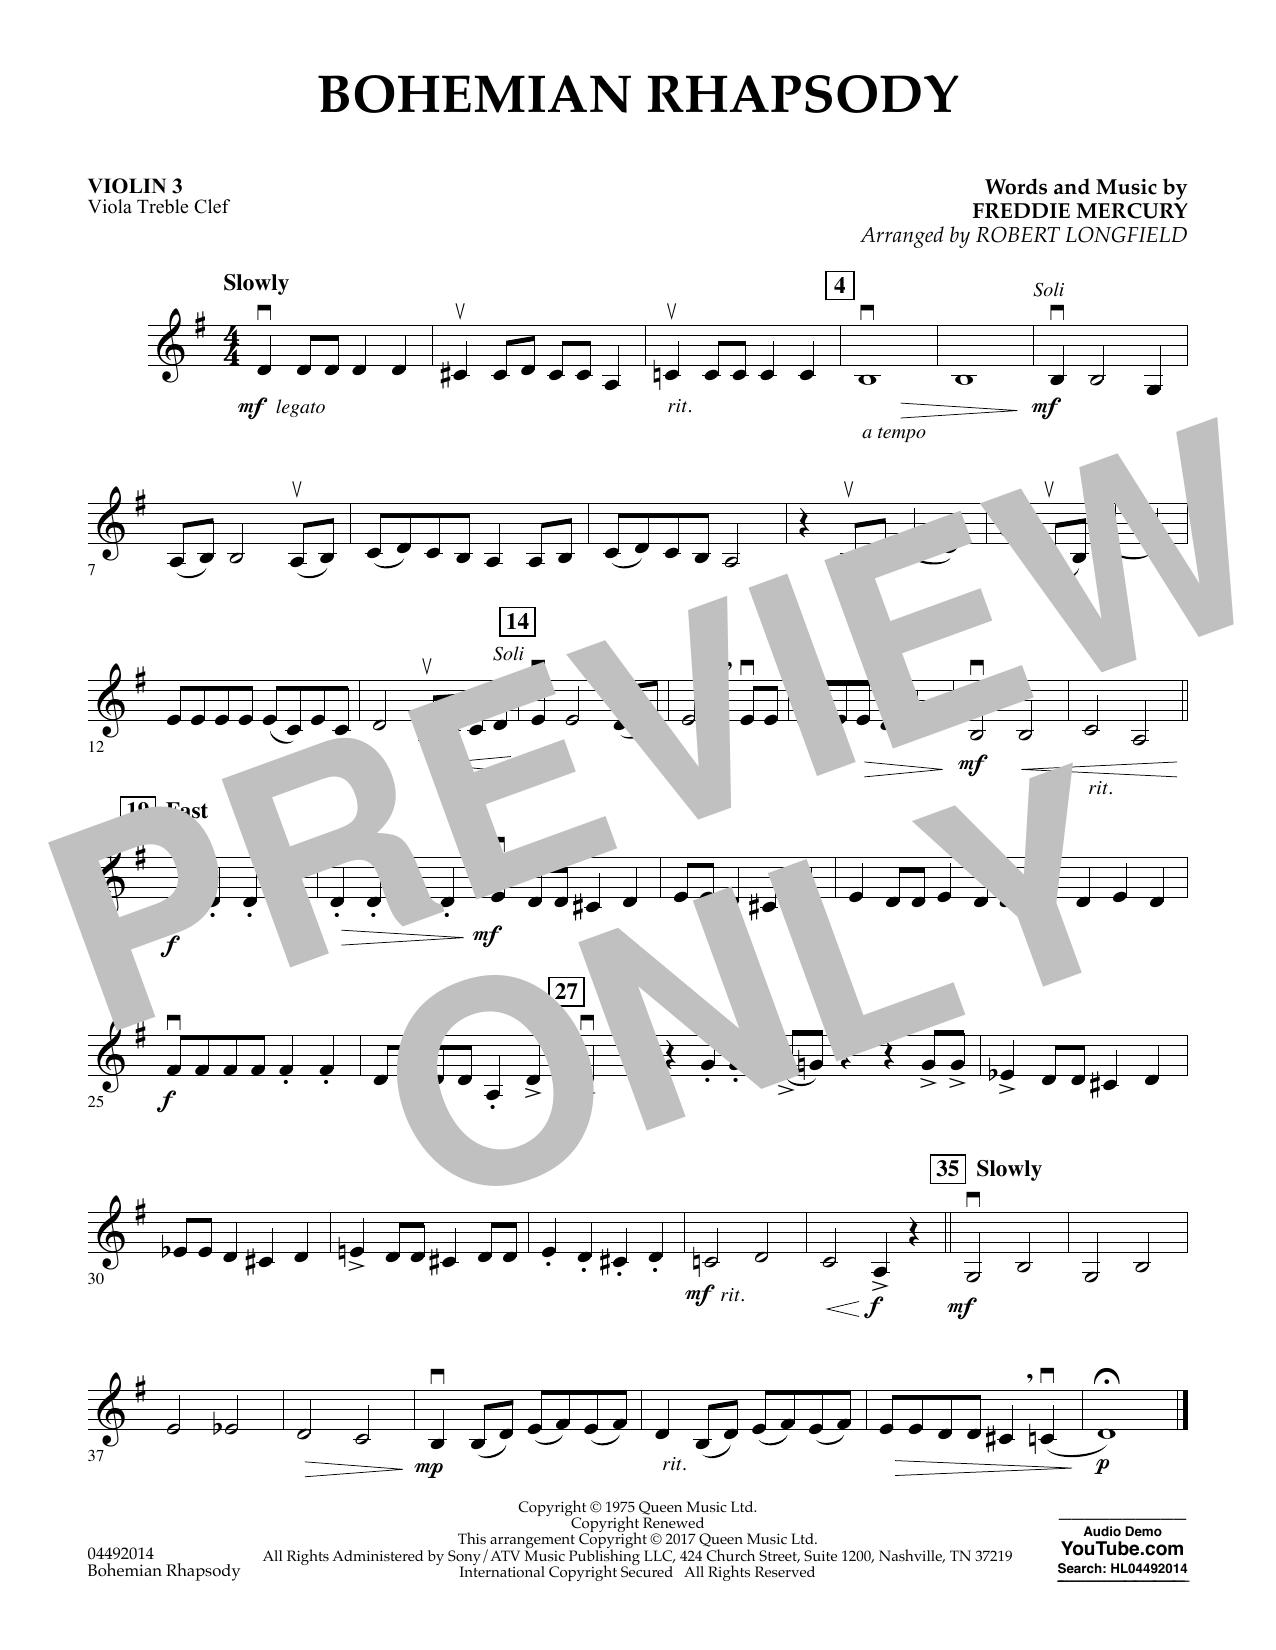 Robert Longfield Bohemian Rhapsody - Violin 3 (Viola T.C.) sheet music notes and chords. Download Printable PDF.